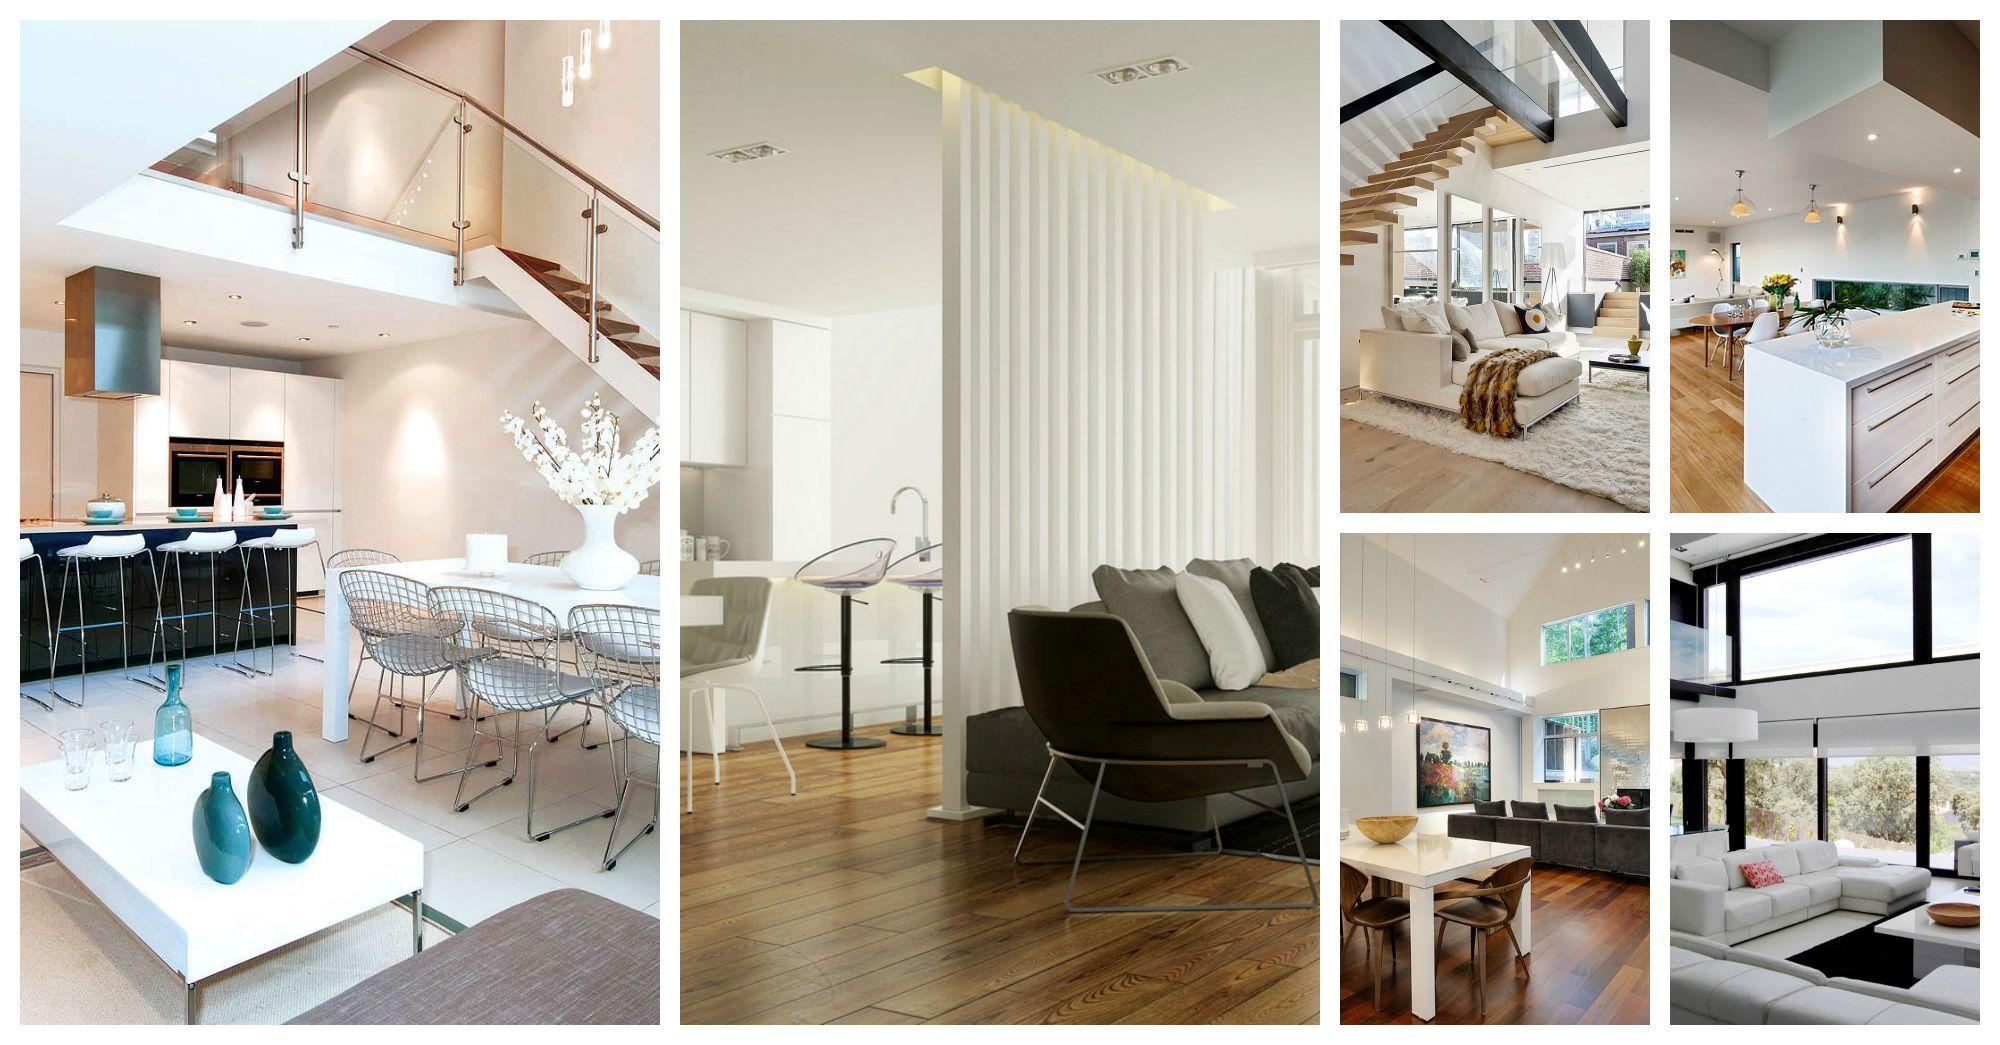 Attractive Open Floor Plan Interiors That Will Fascinate You